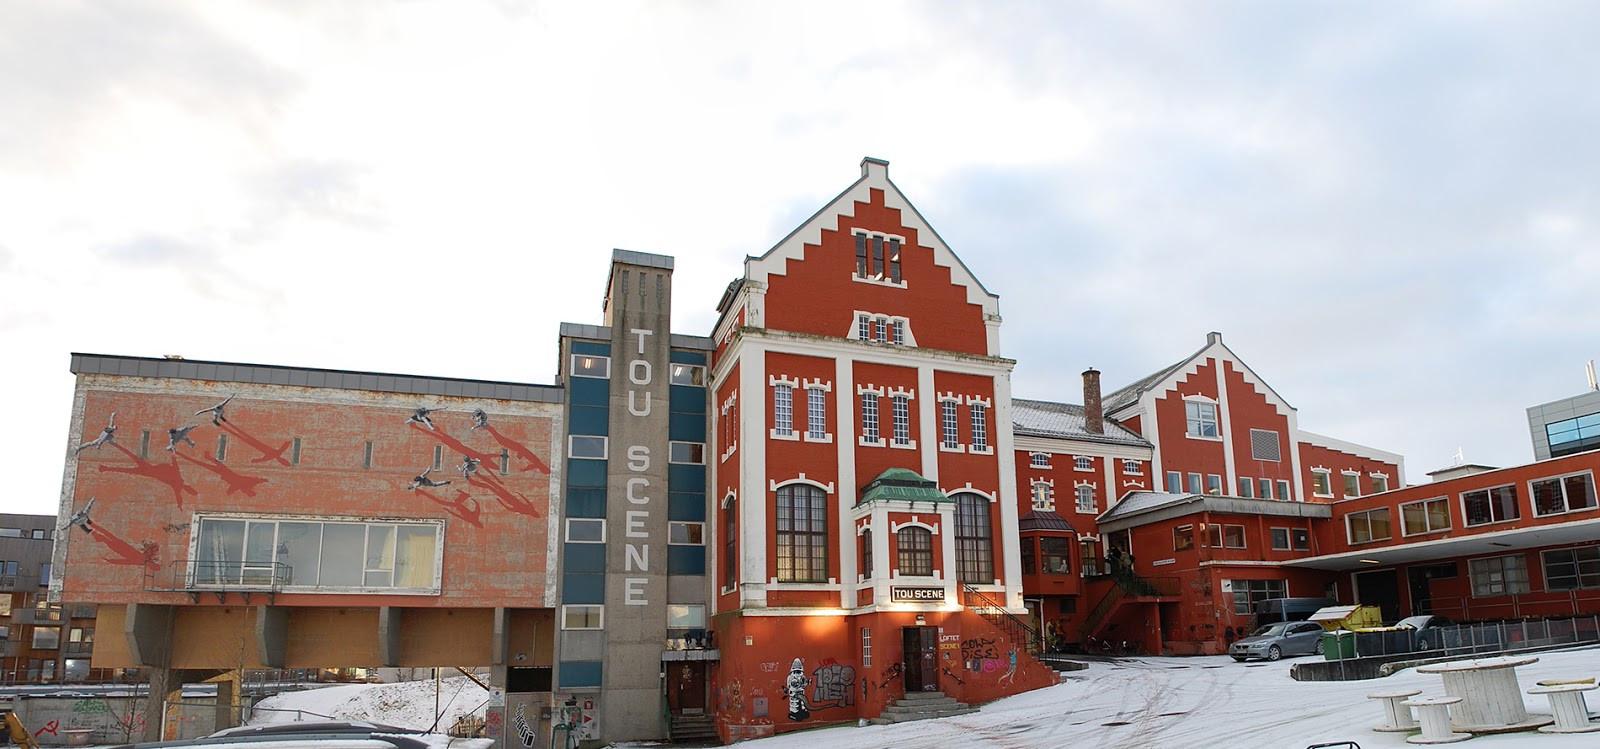 TOU SCENE, Taoh Residency, Stavanger, Norway.